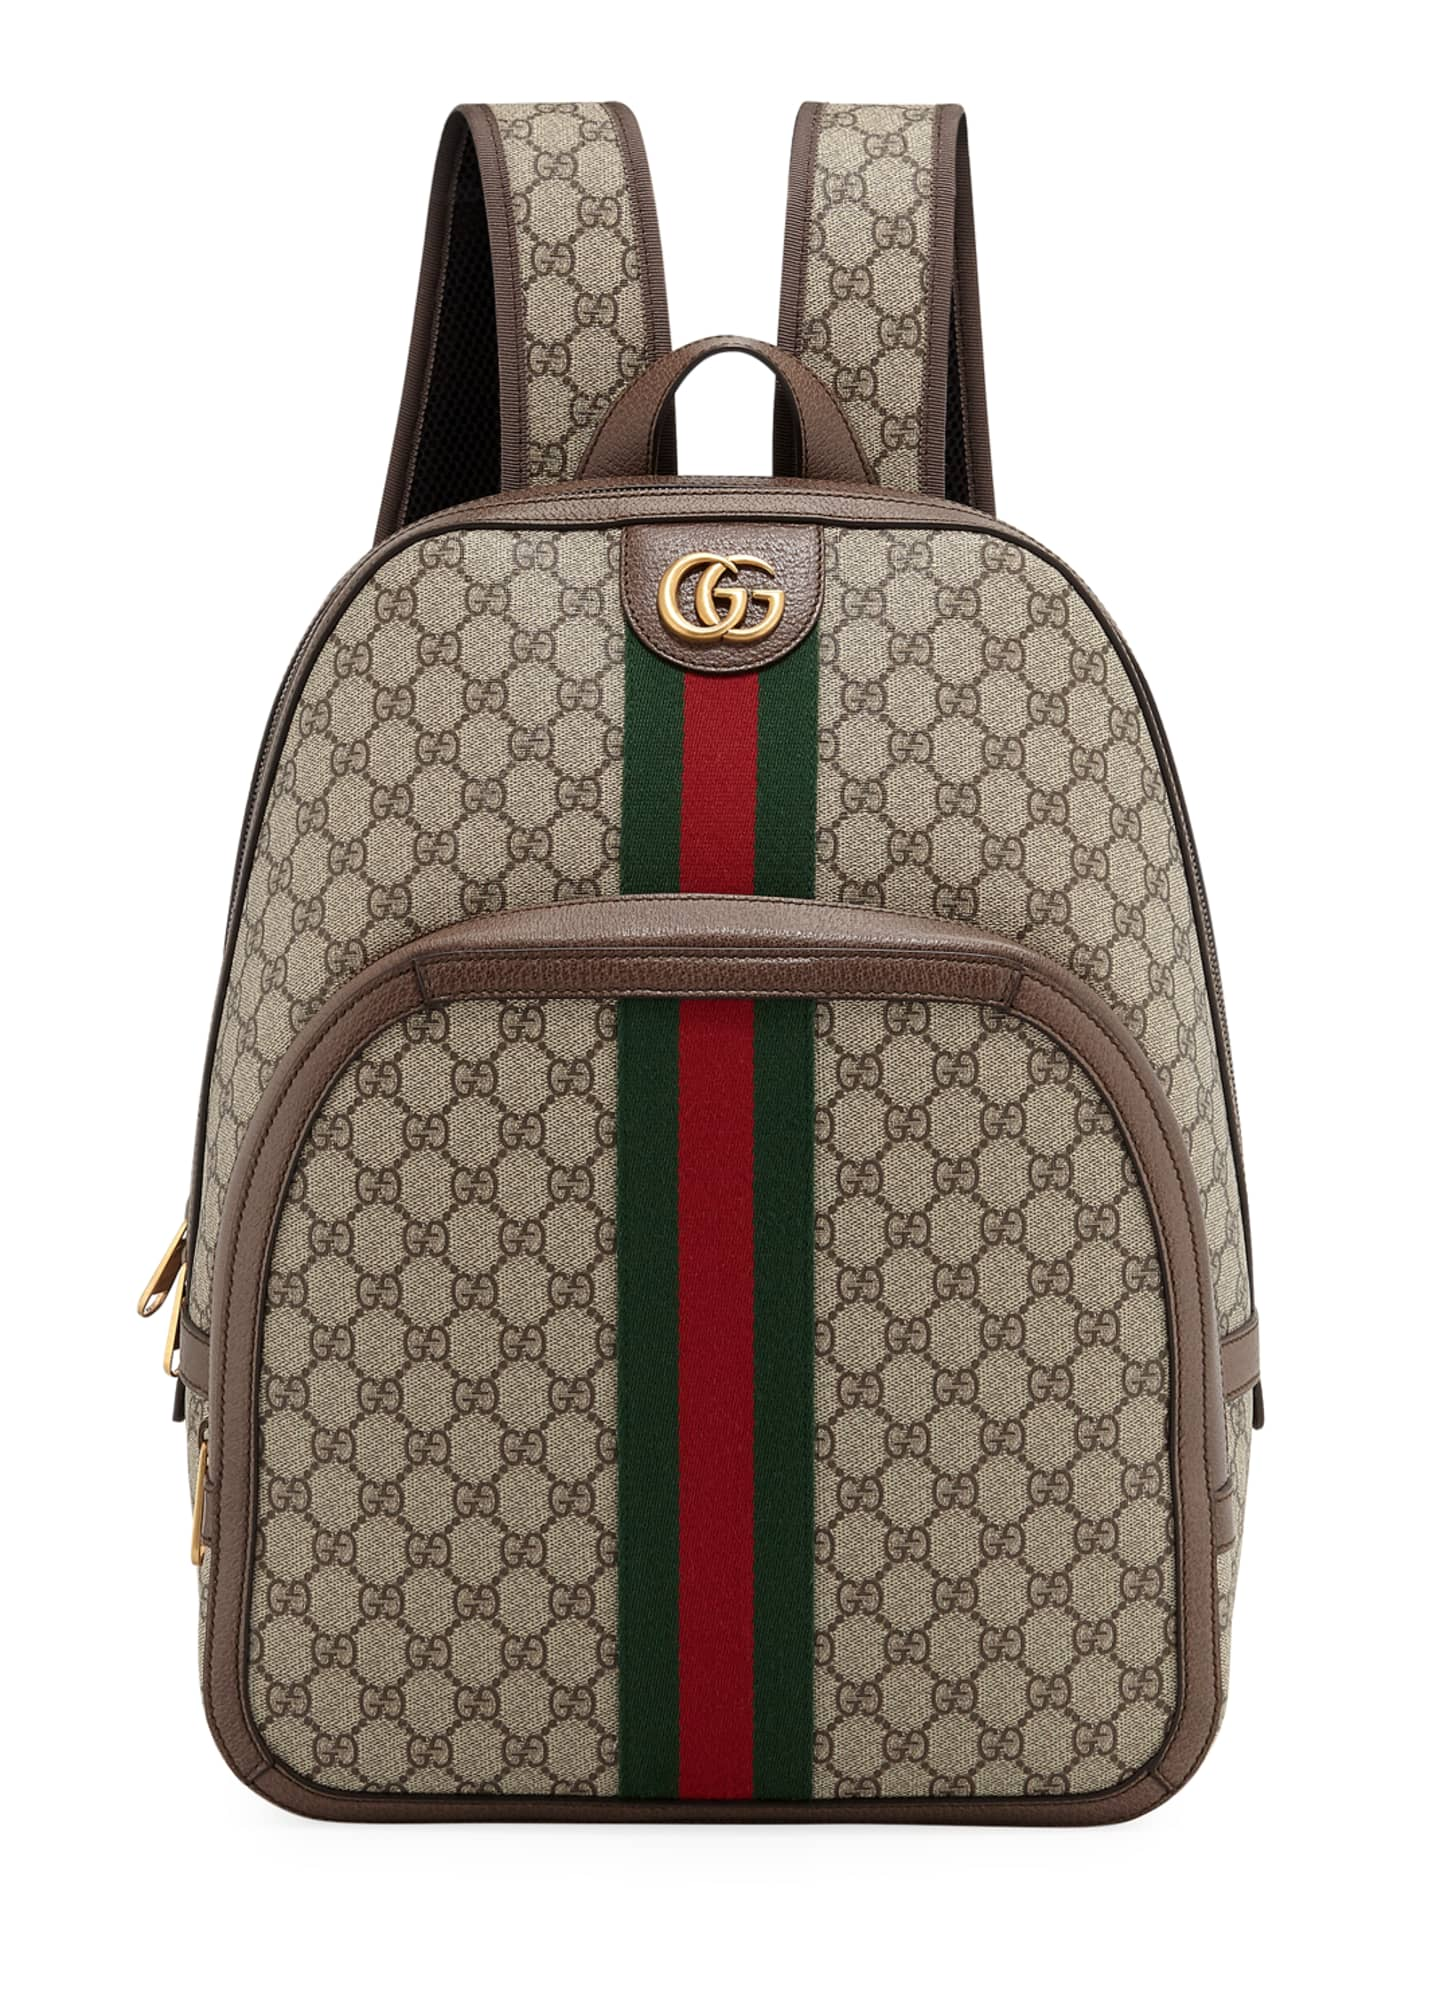 Gucci Men's GG Supreme Medium Canvas Backpack